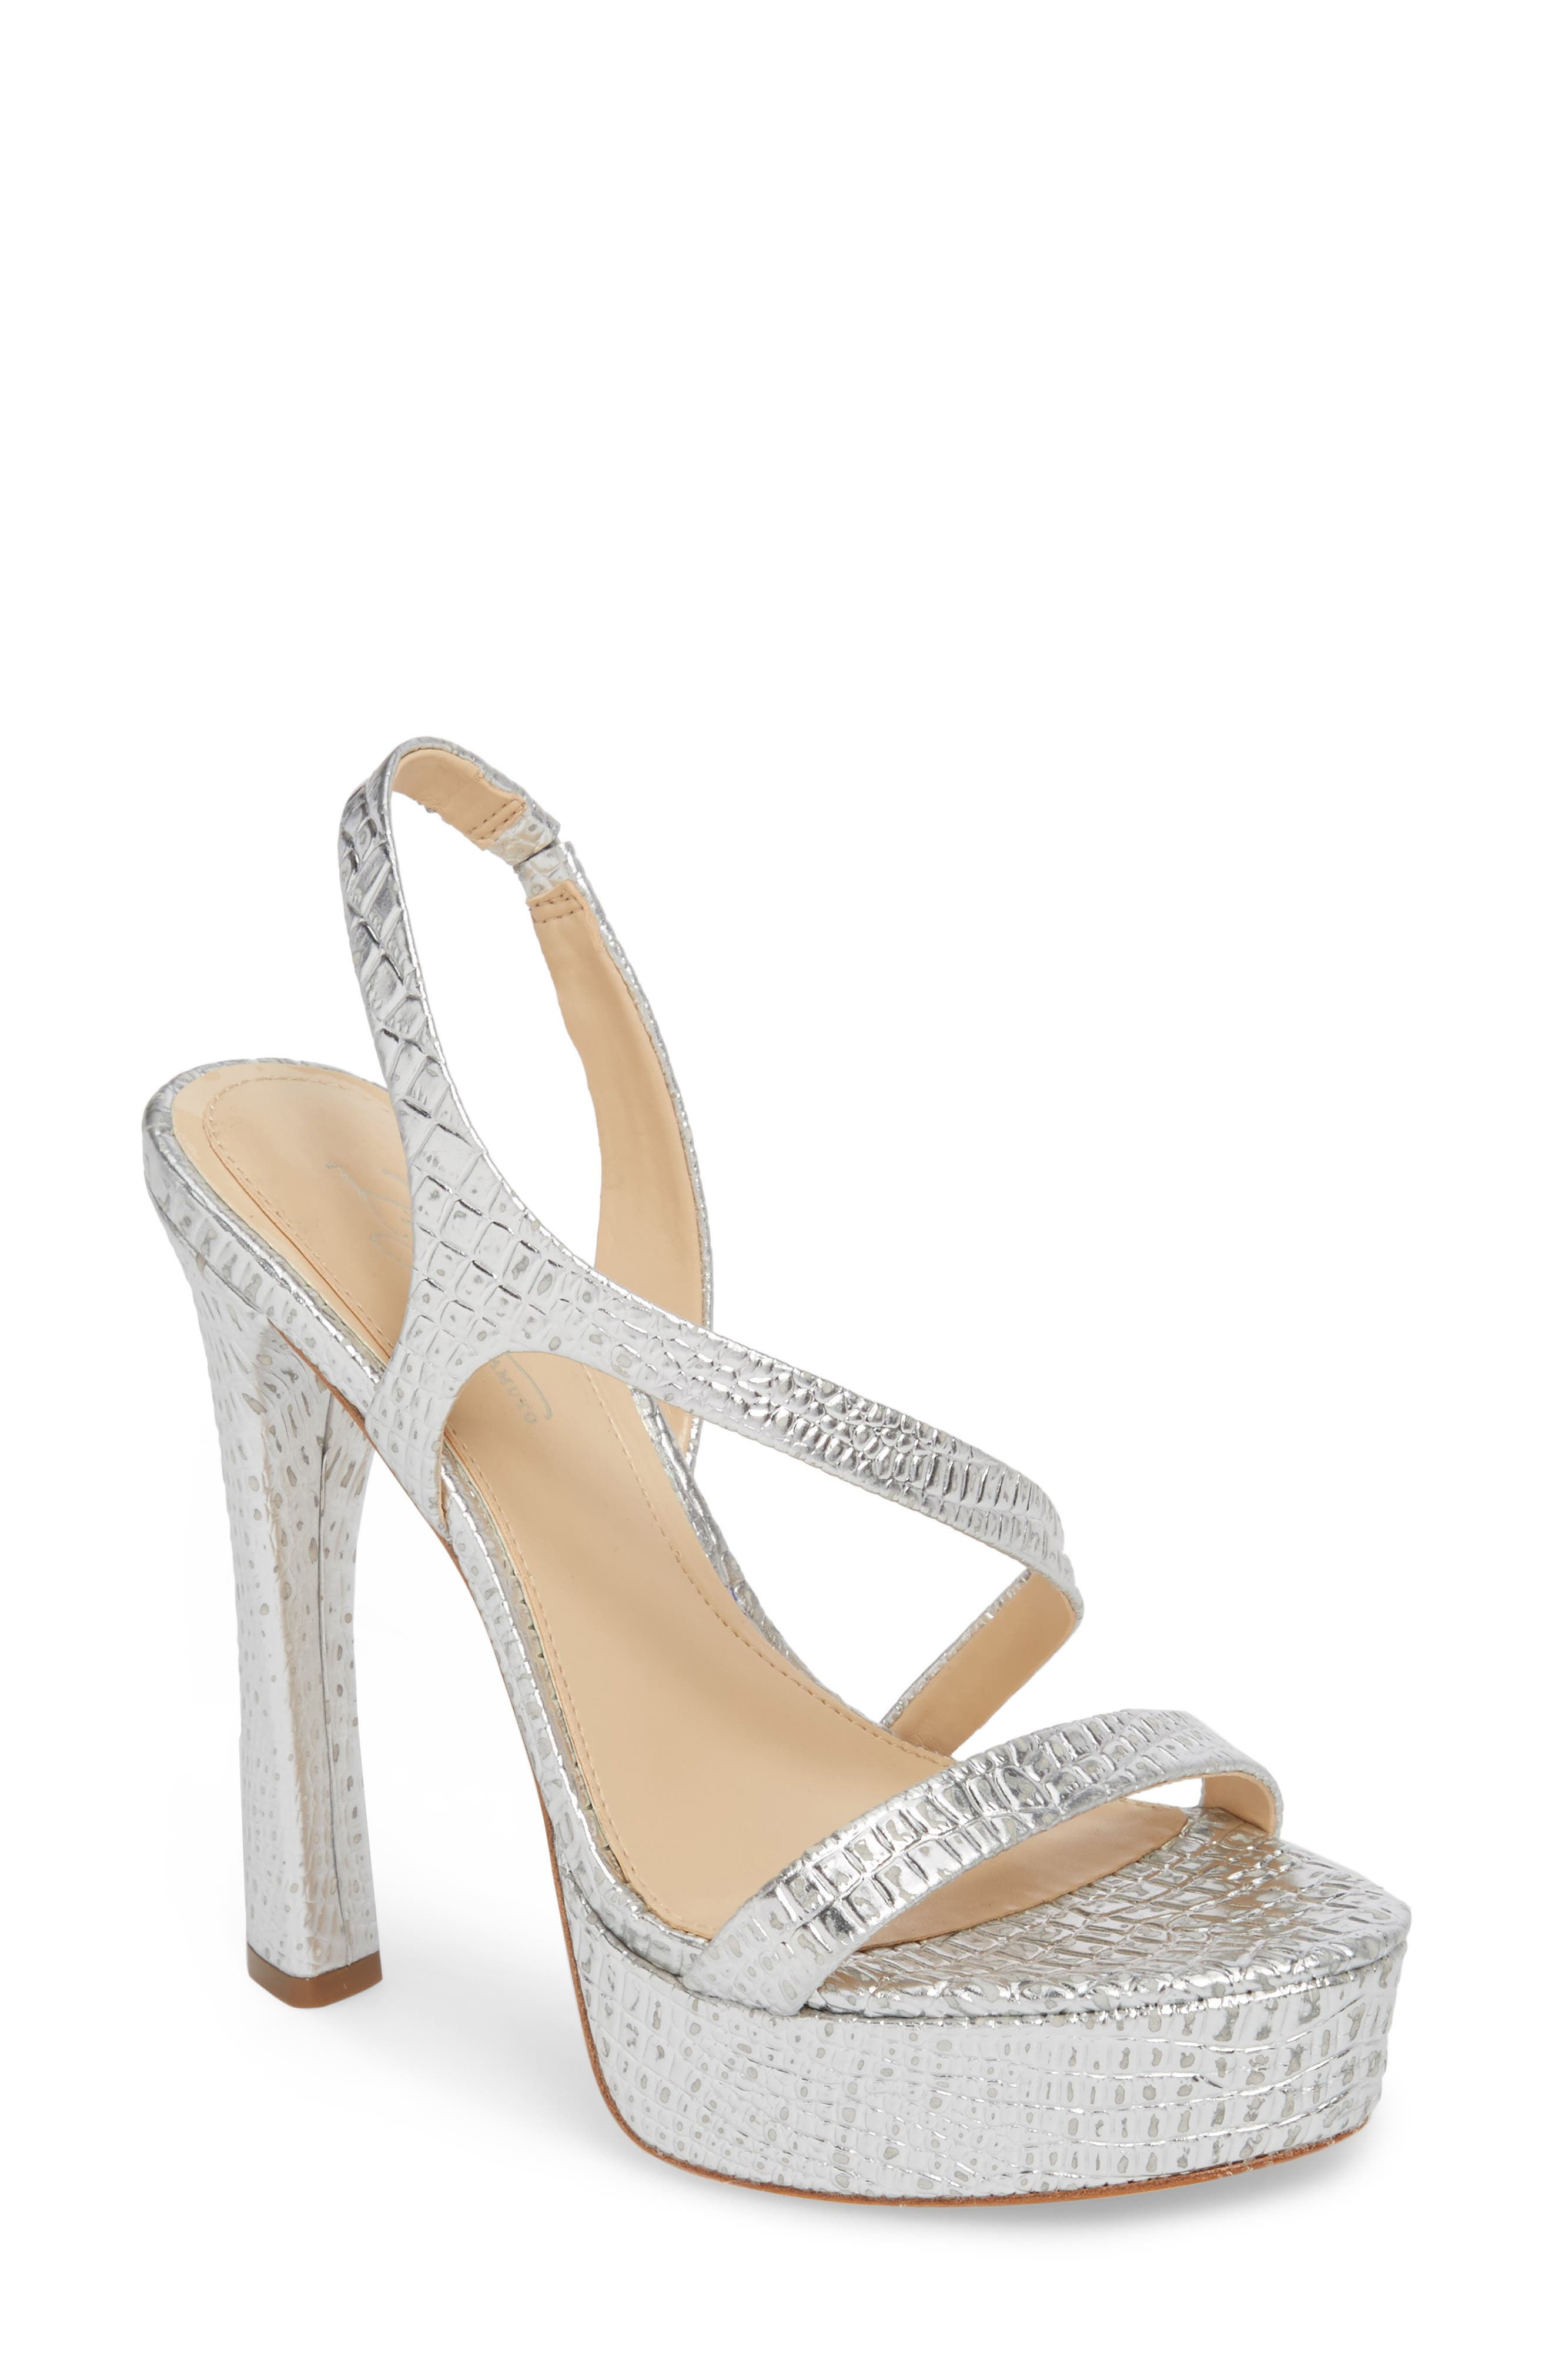 Imagine By Vince Camuto Prent Asymmetrical Platform Sandal- Metallic